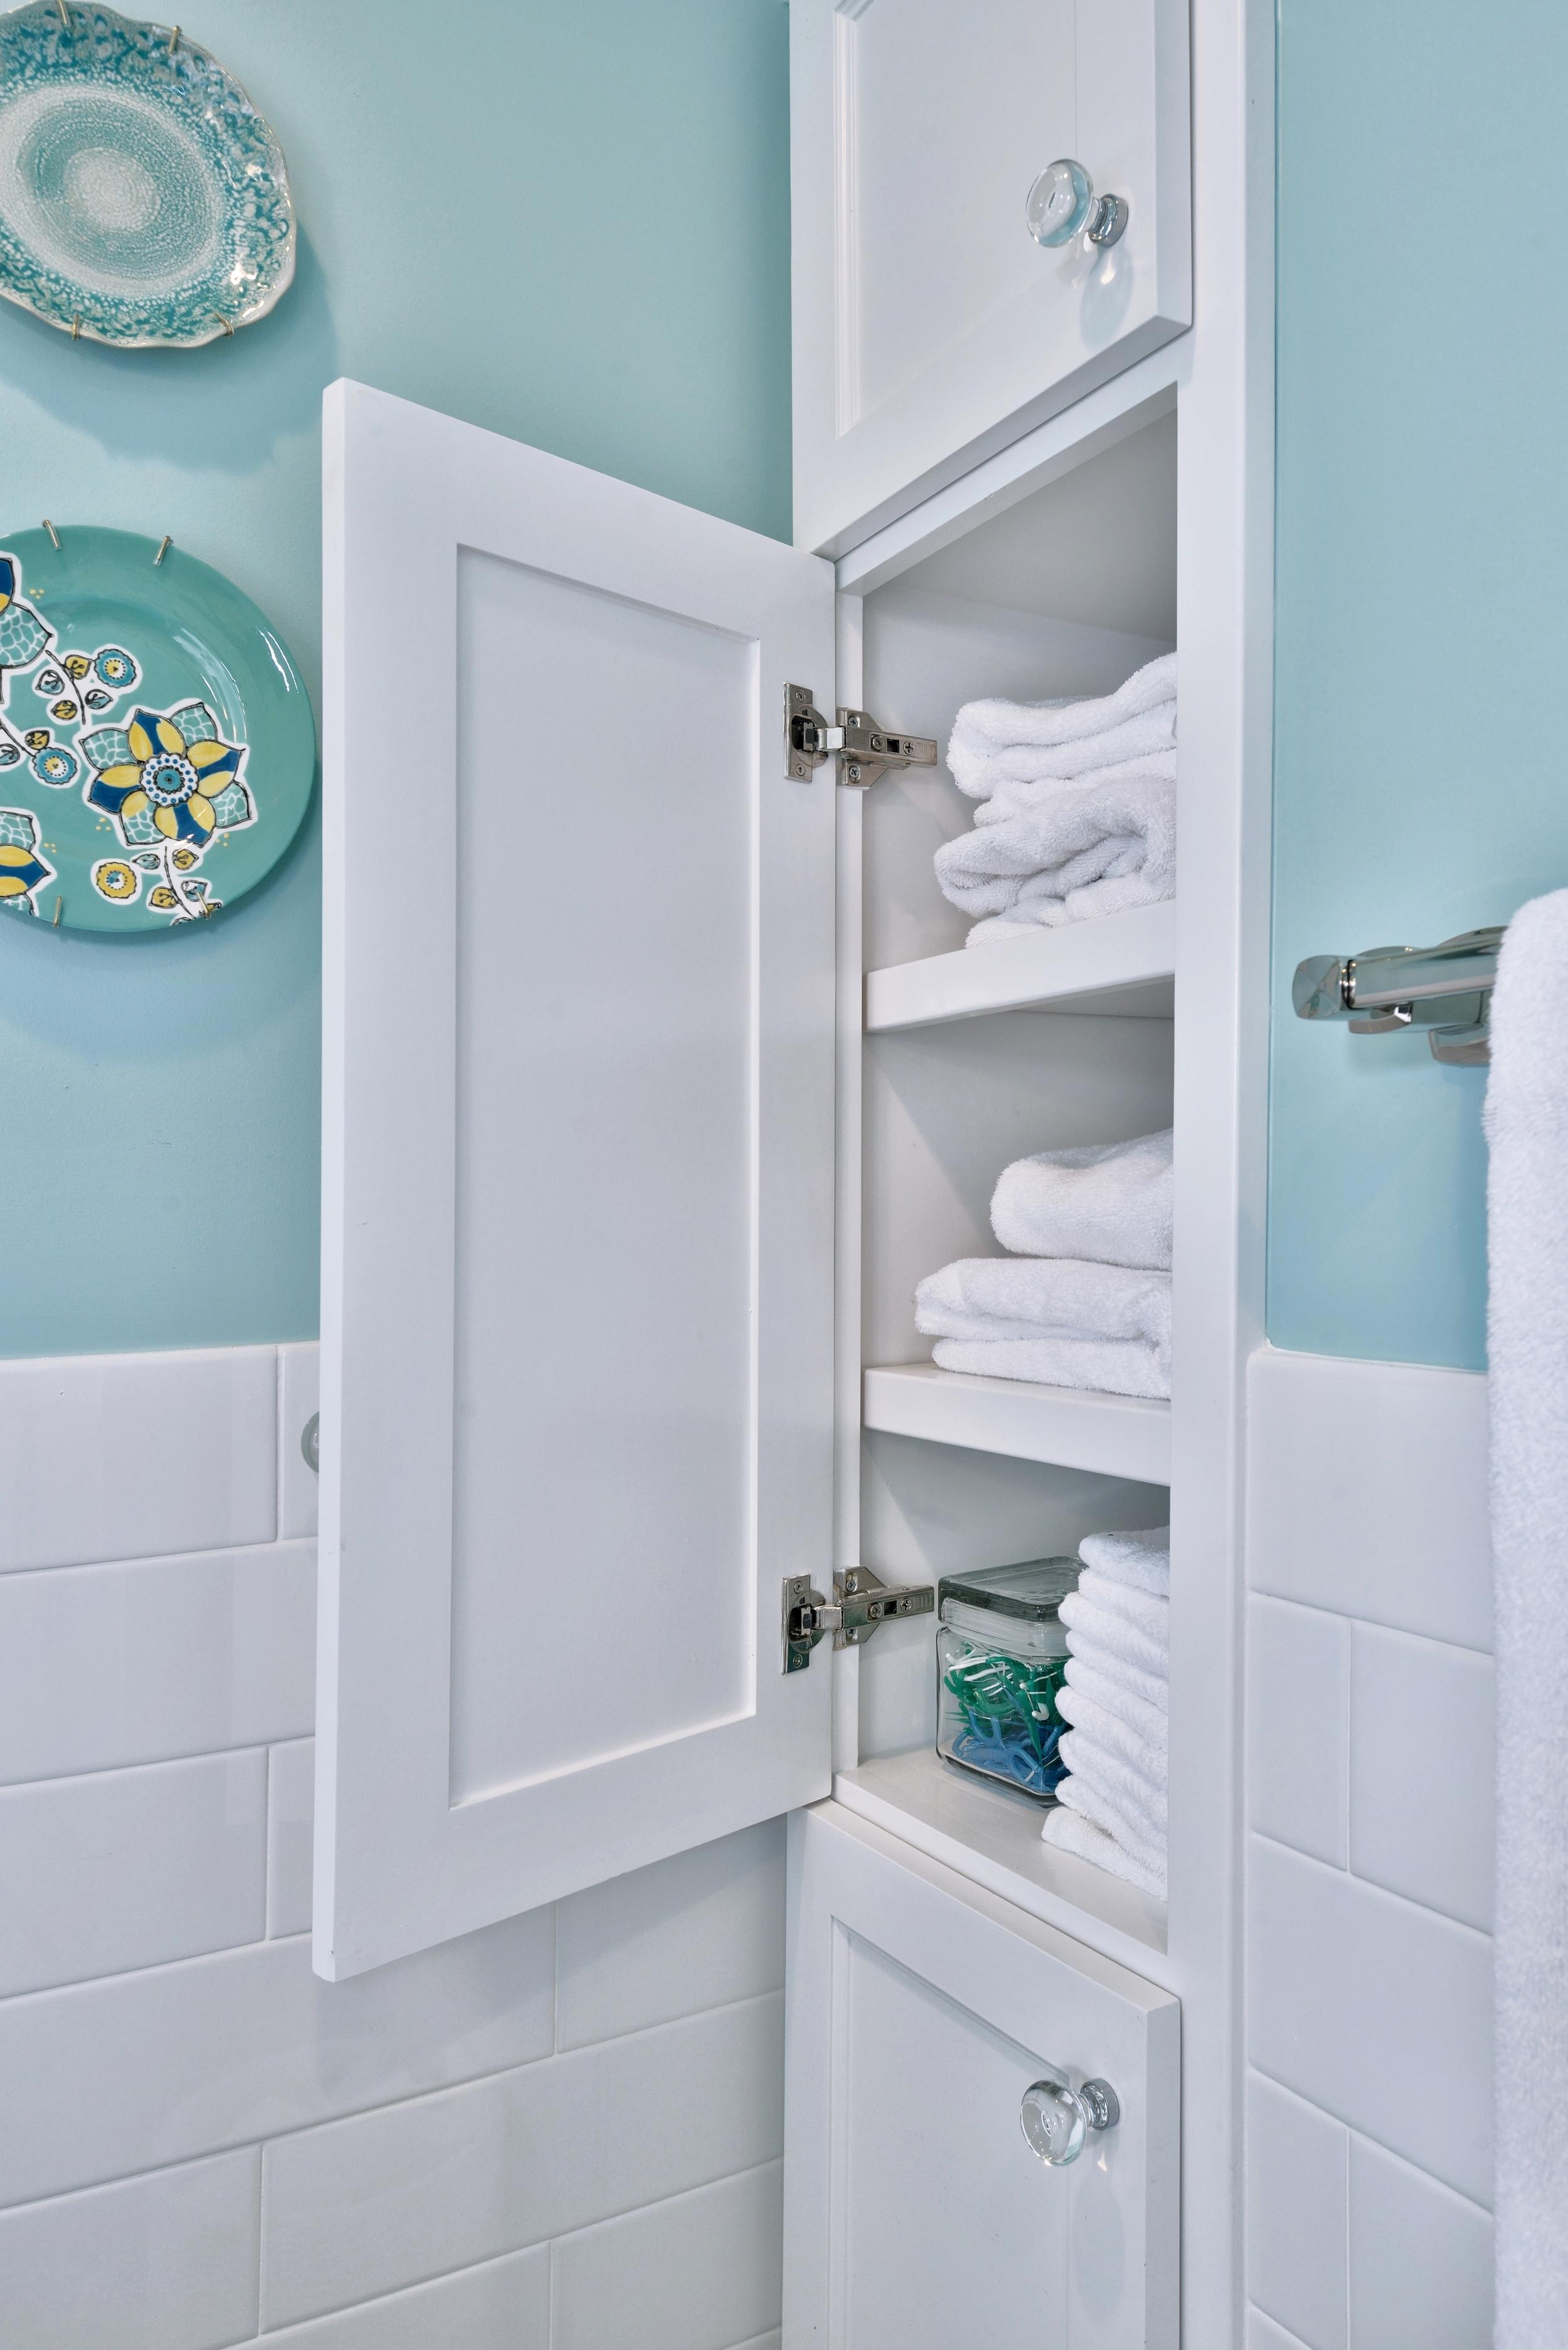 Tiffany blue girl bathroom remodel, Designer: Carla Aston